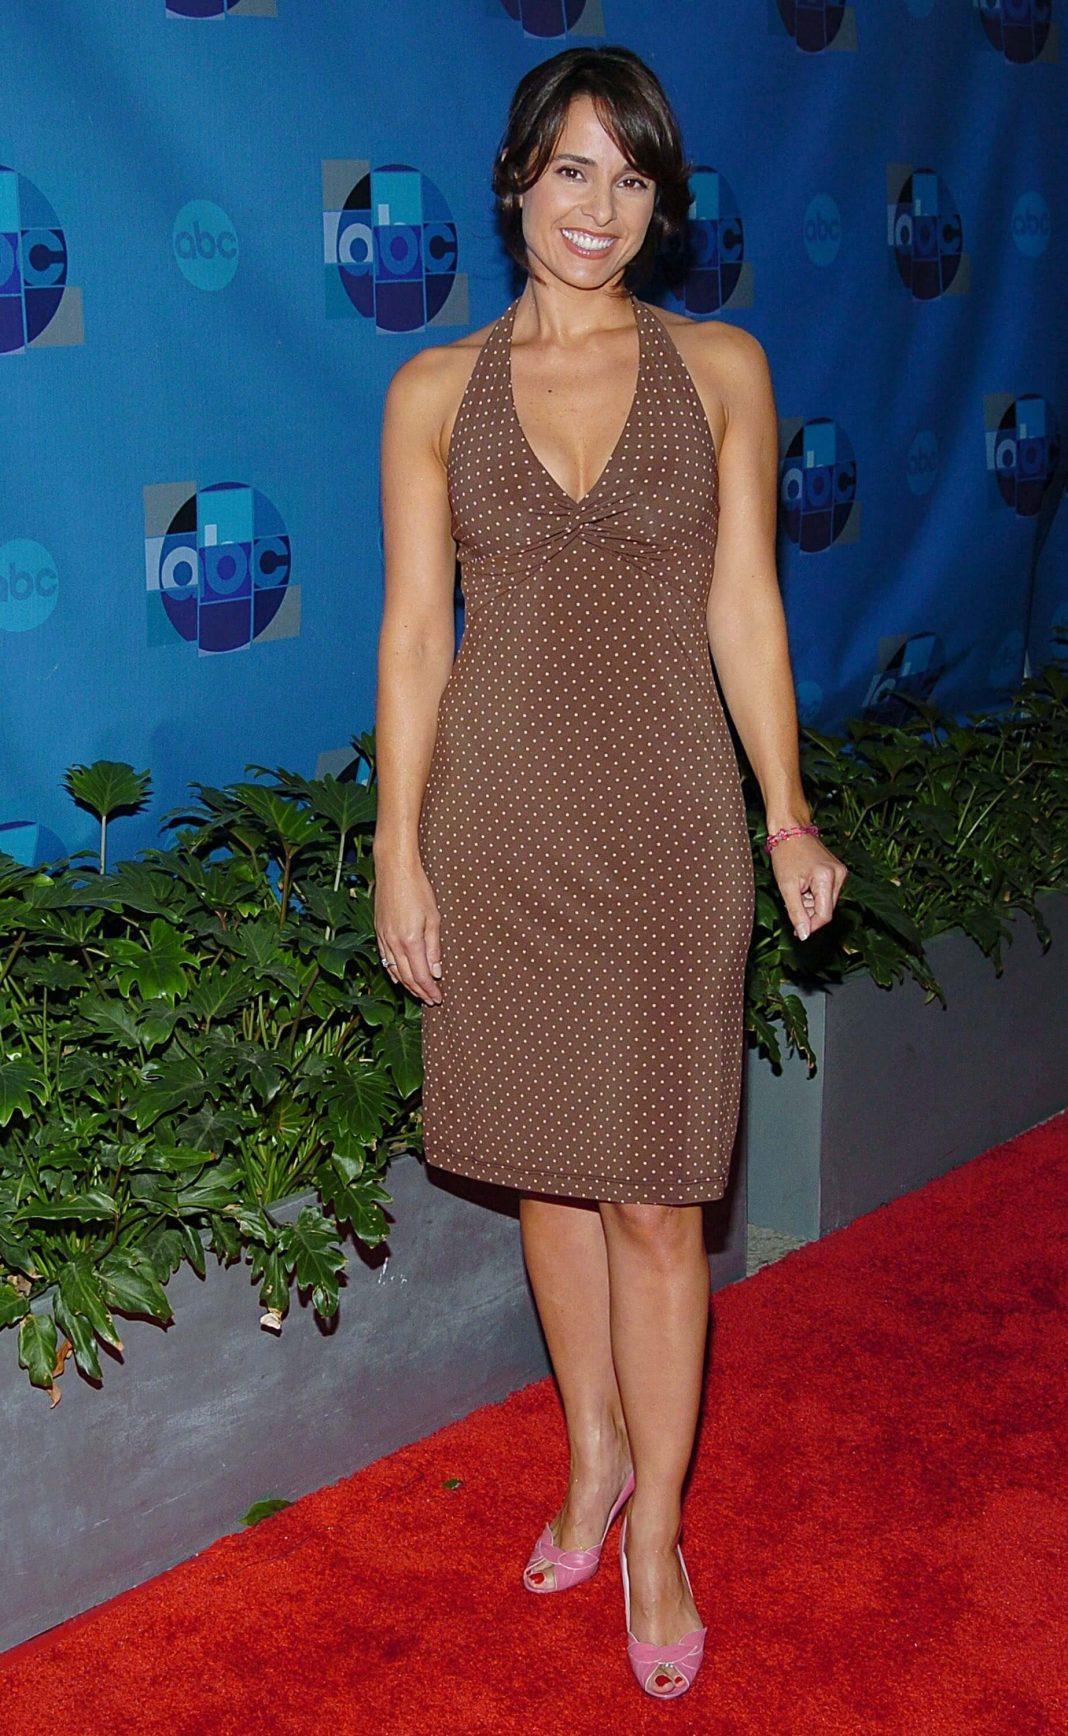 Jacqueline Obradors hot cleavage pics